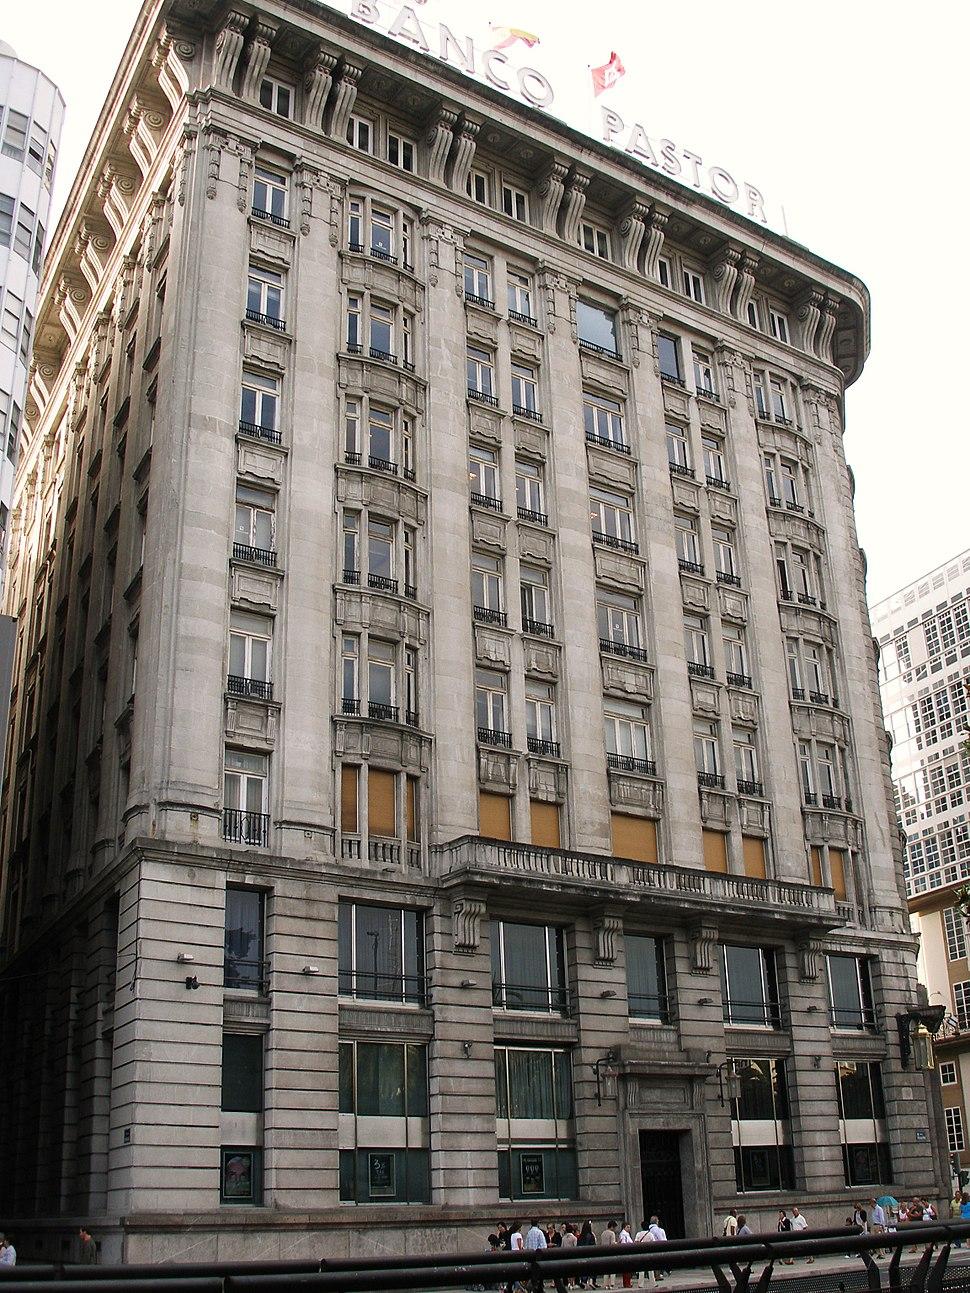 Edificio banco pastor